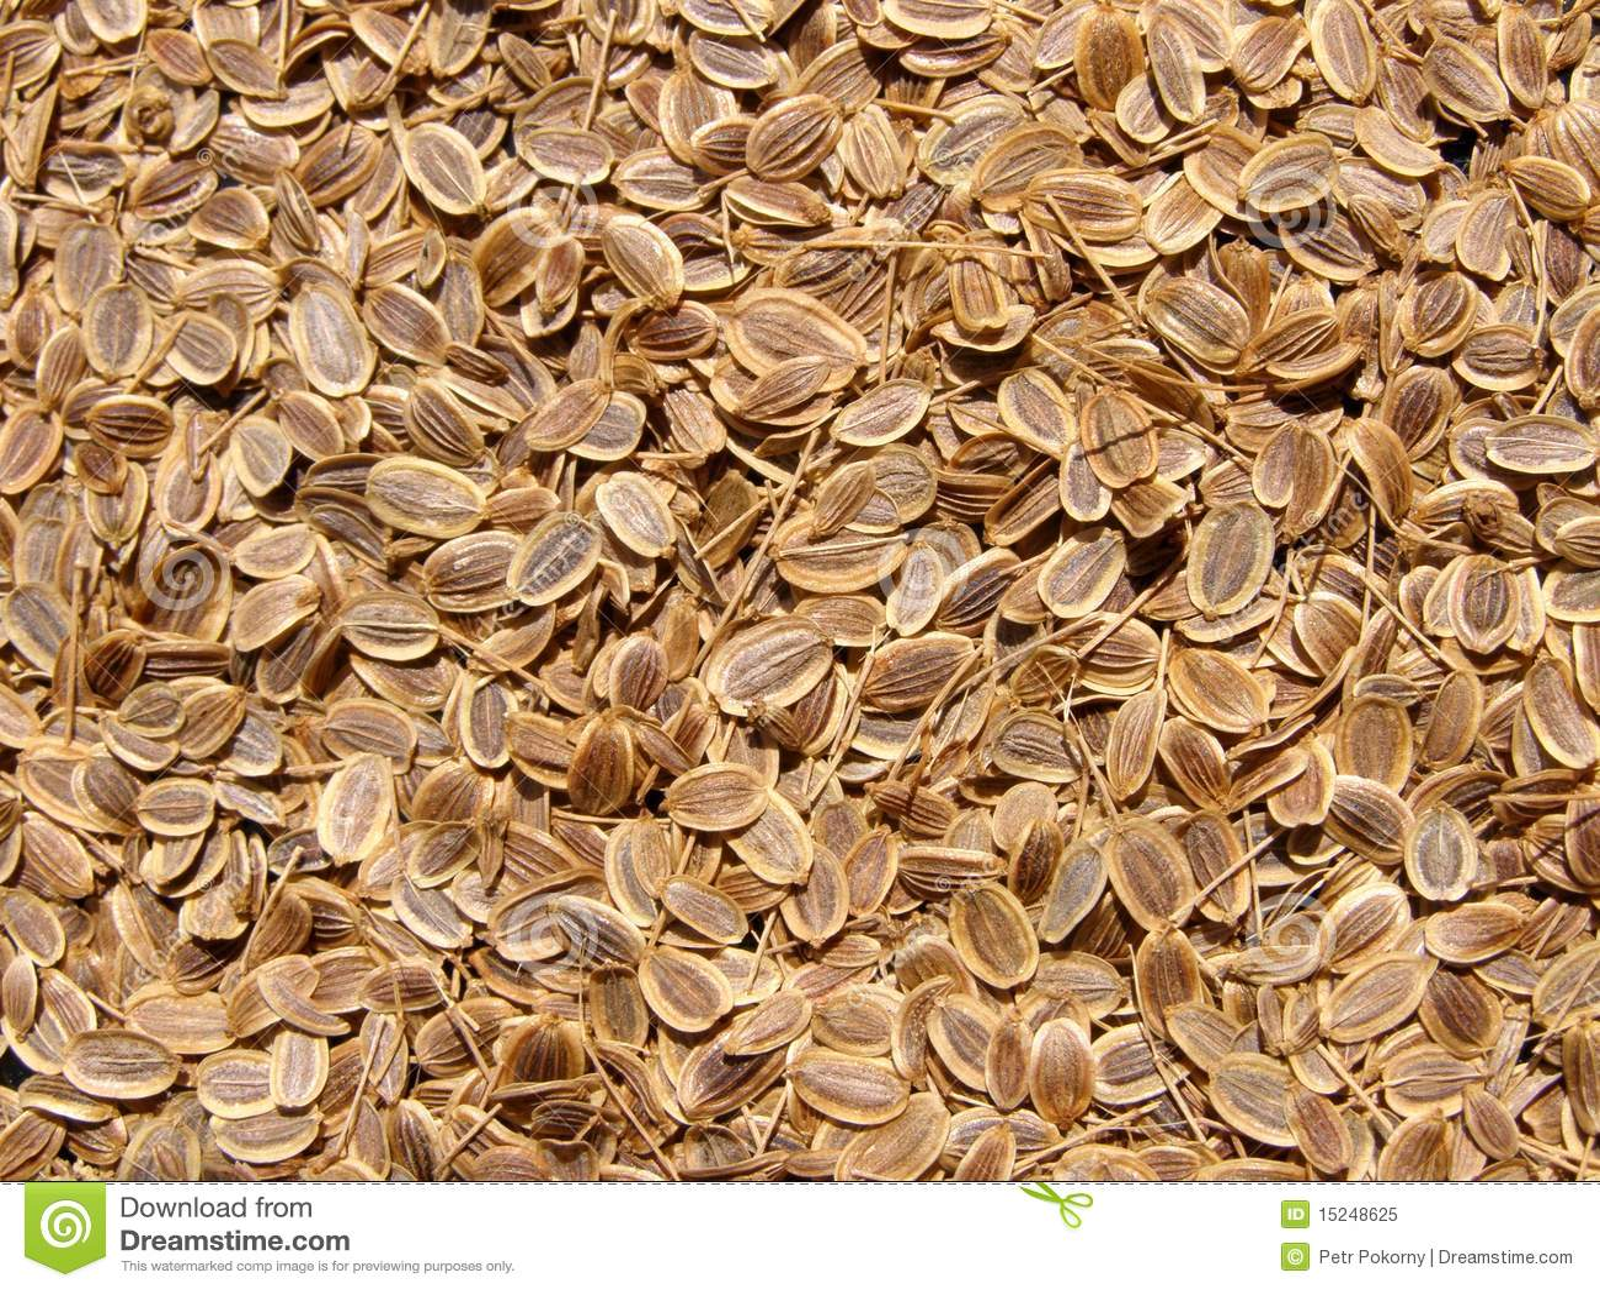 texture de graines d 39 aneth image stock image du fantastique 15248625. Black Bedroom Furniture Sets. Home Design Ideas